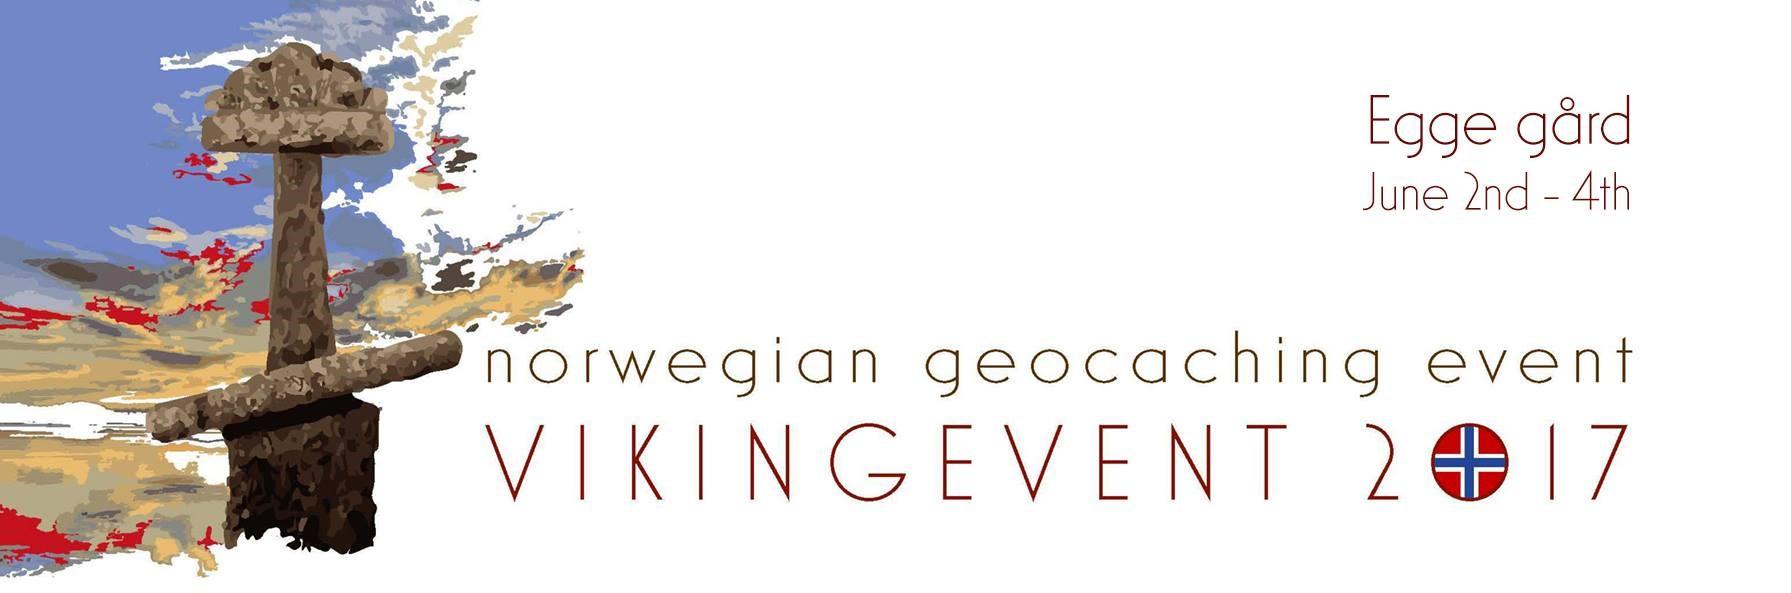 Vikingevent2017 logo